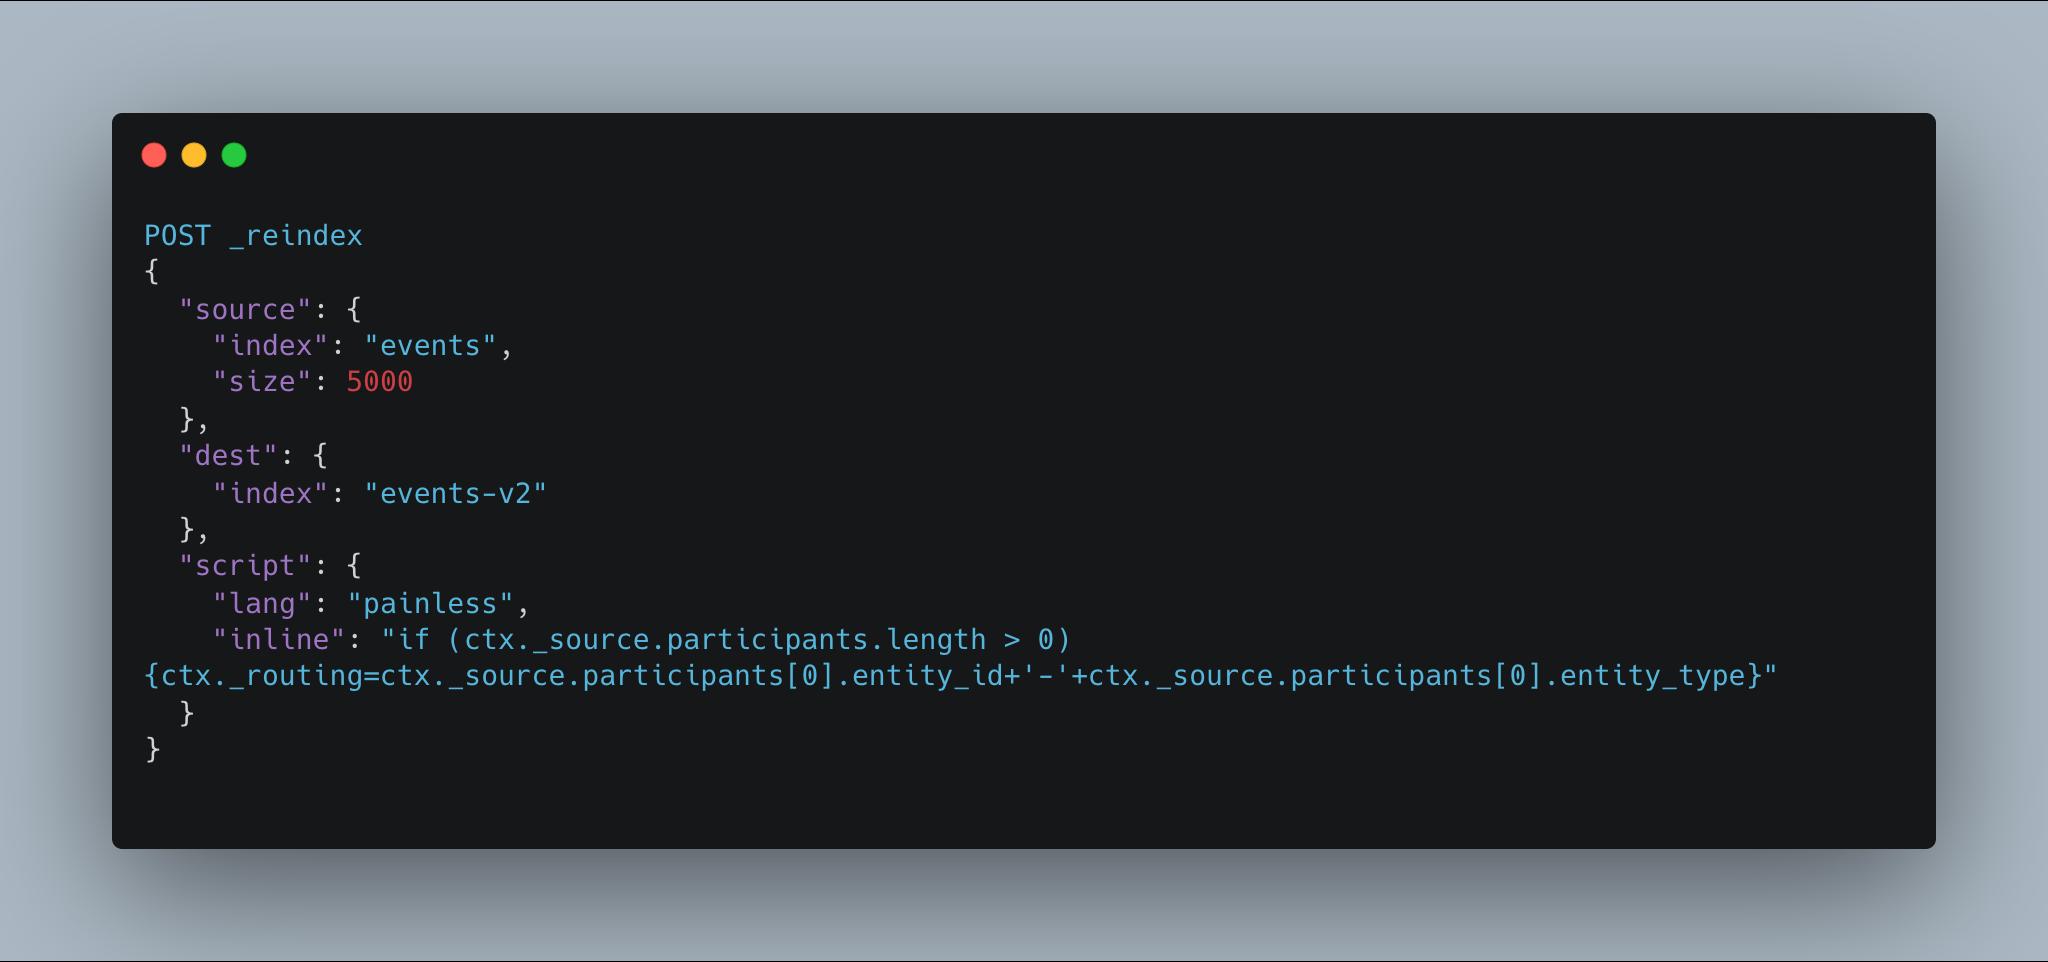 Elasticsearch reindex API with custom _routing set